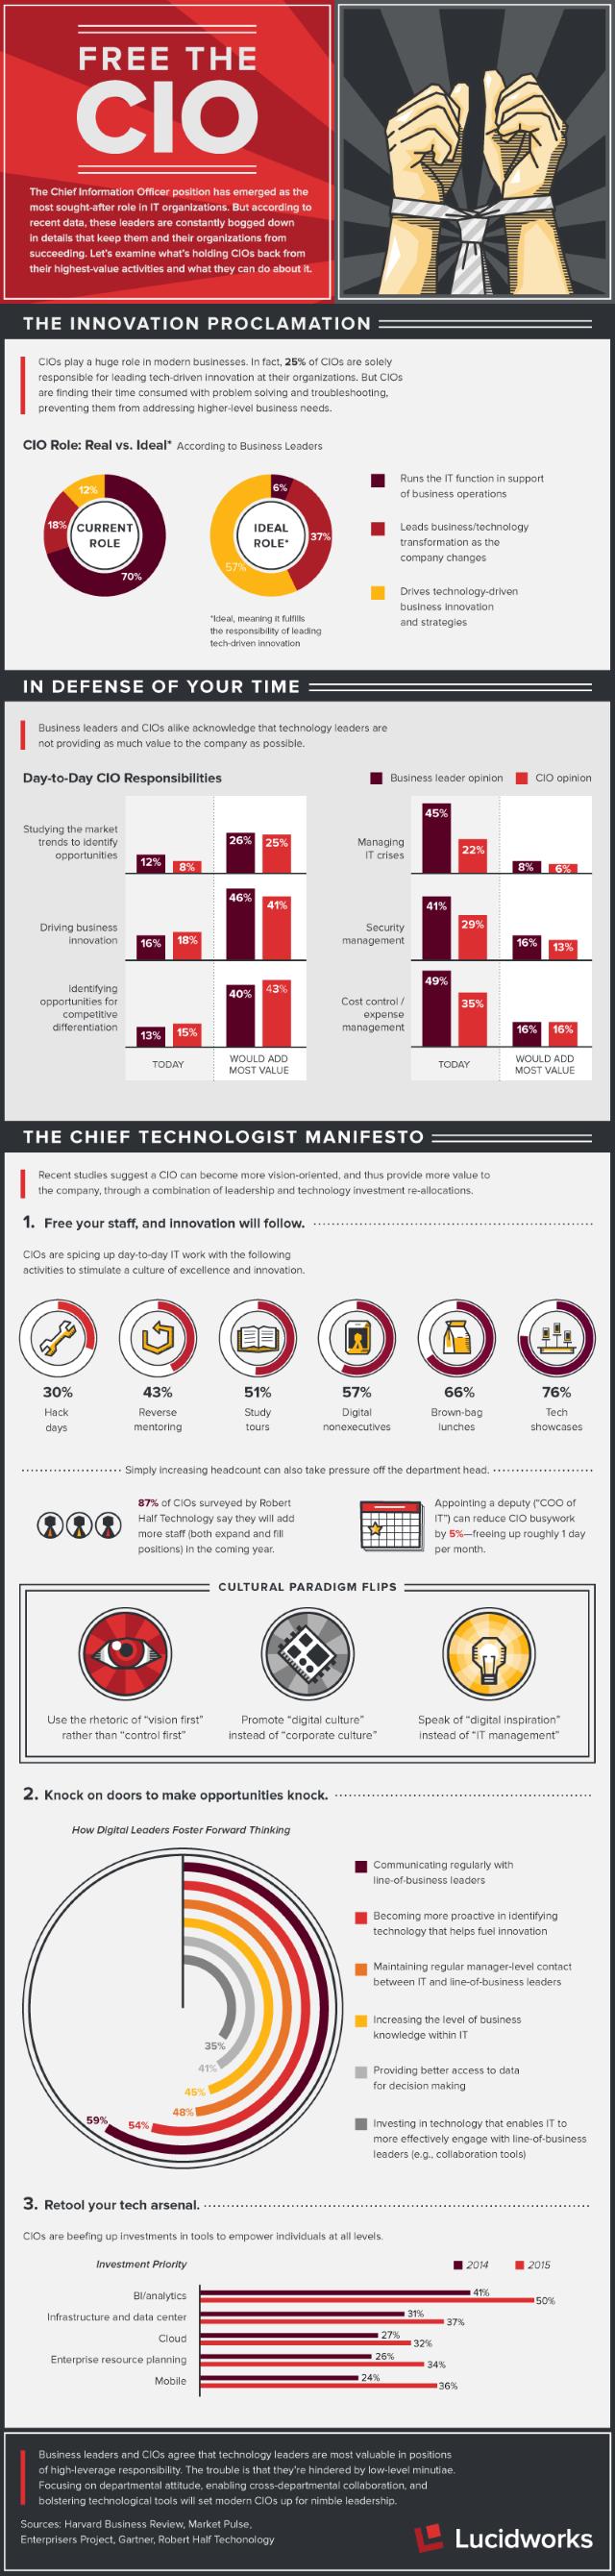 Free_The_CIO_Infographic_Lucidworks